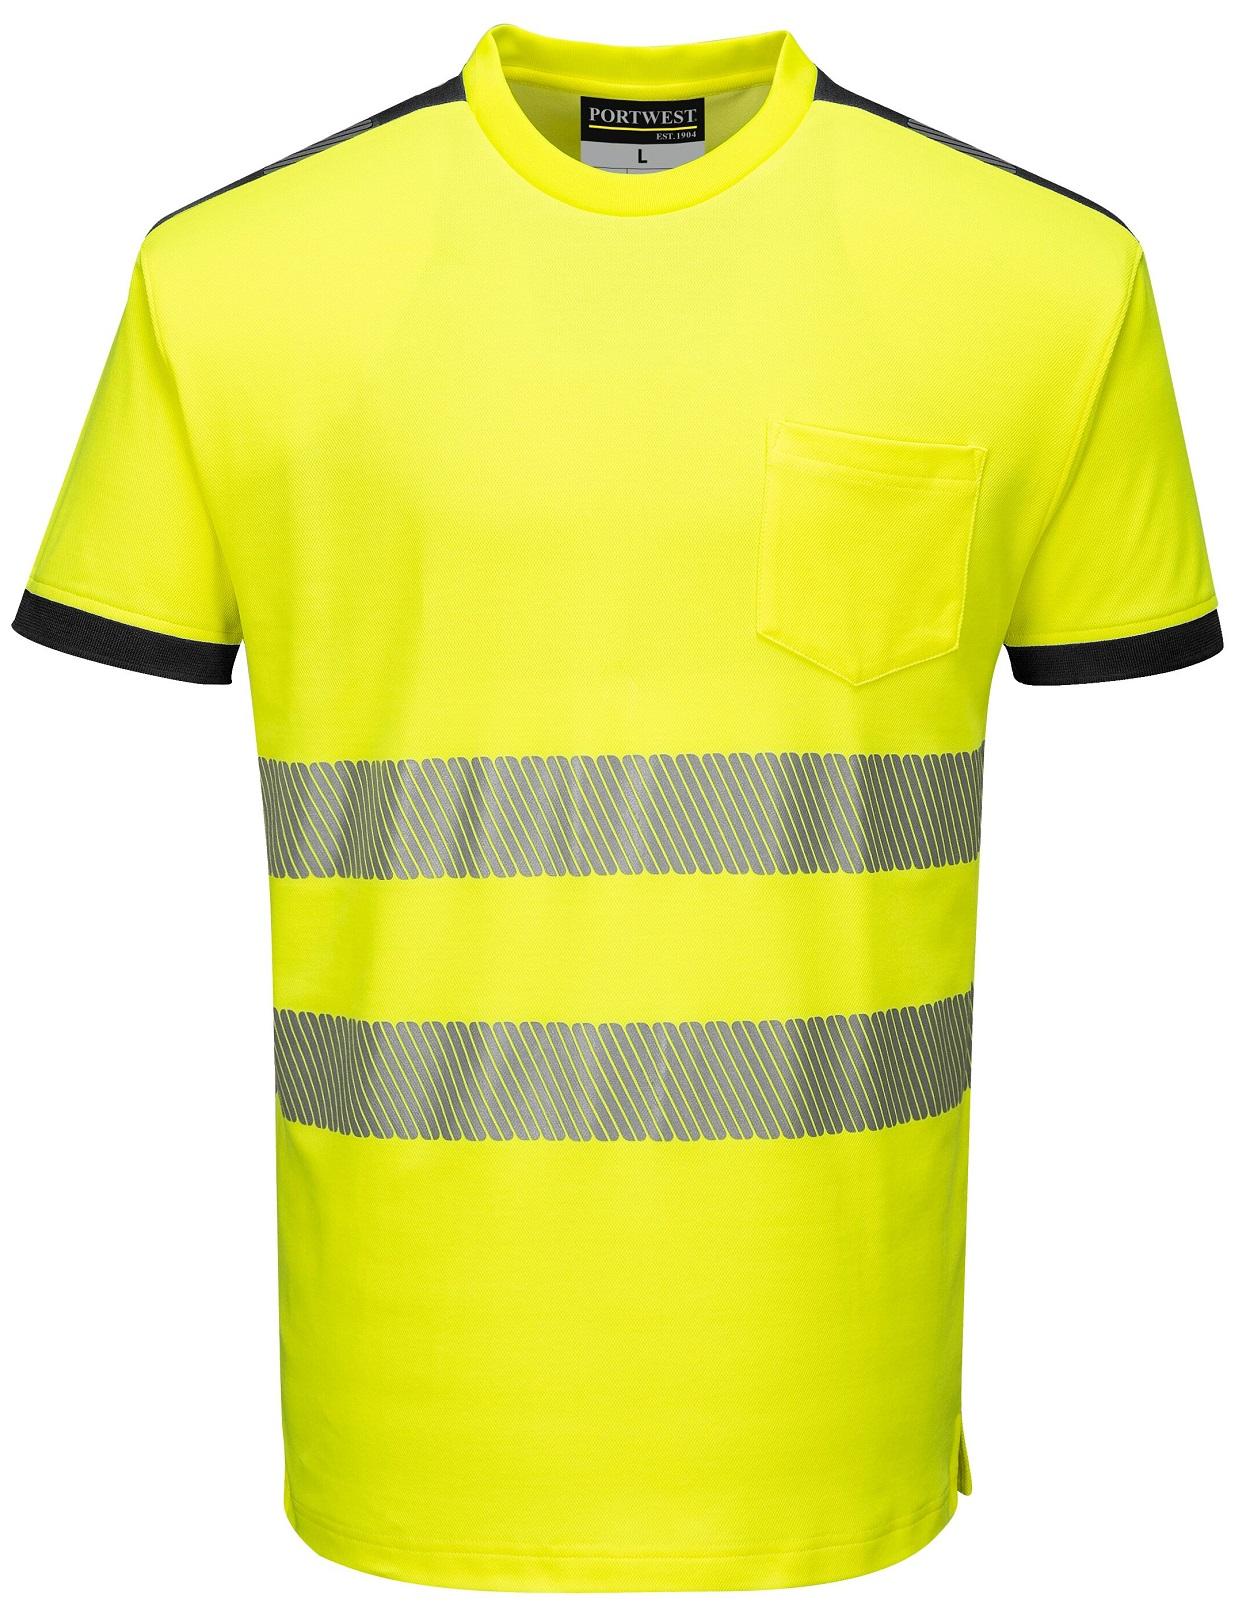 T181-yellow